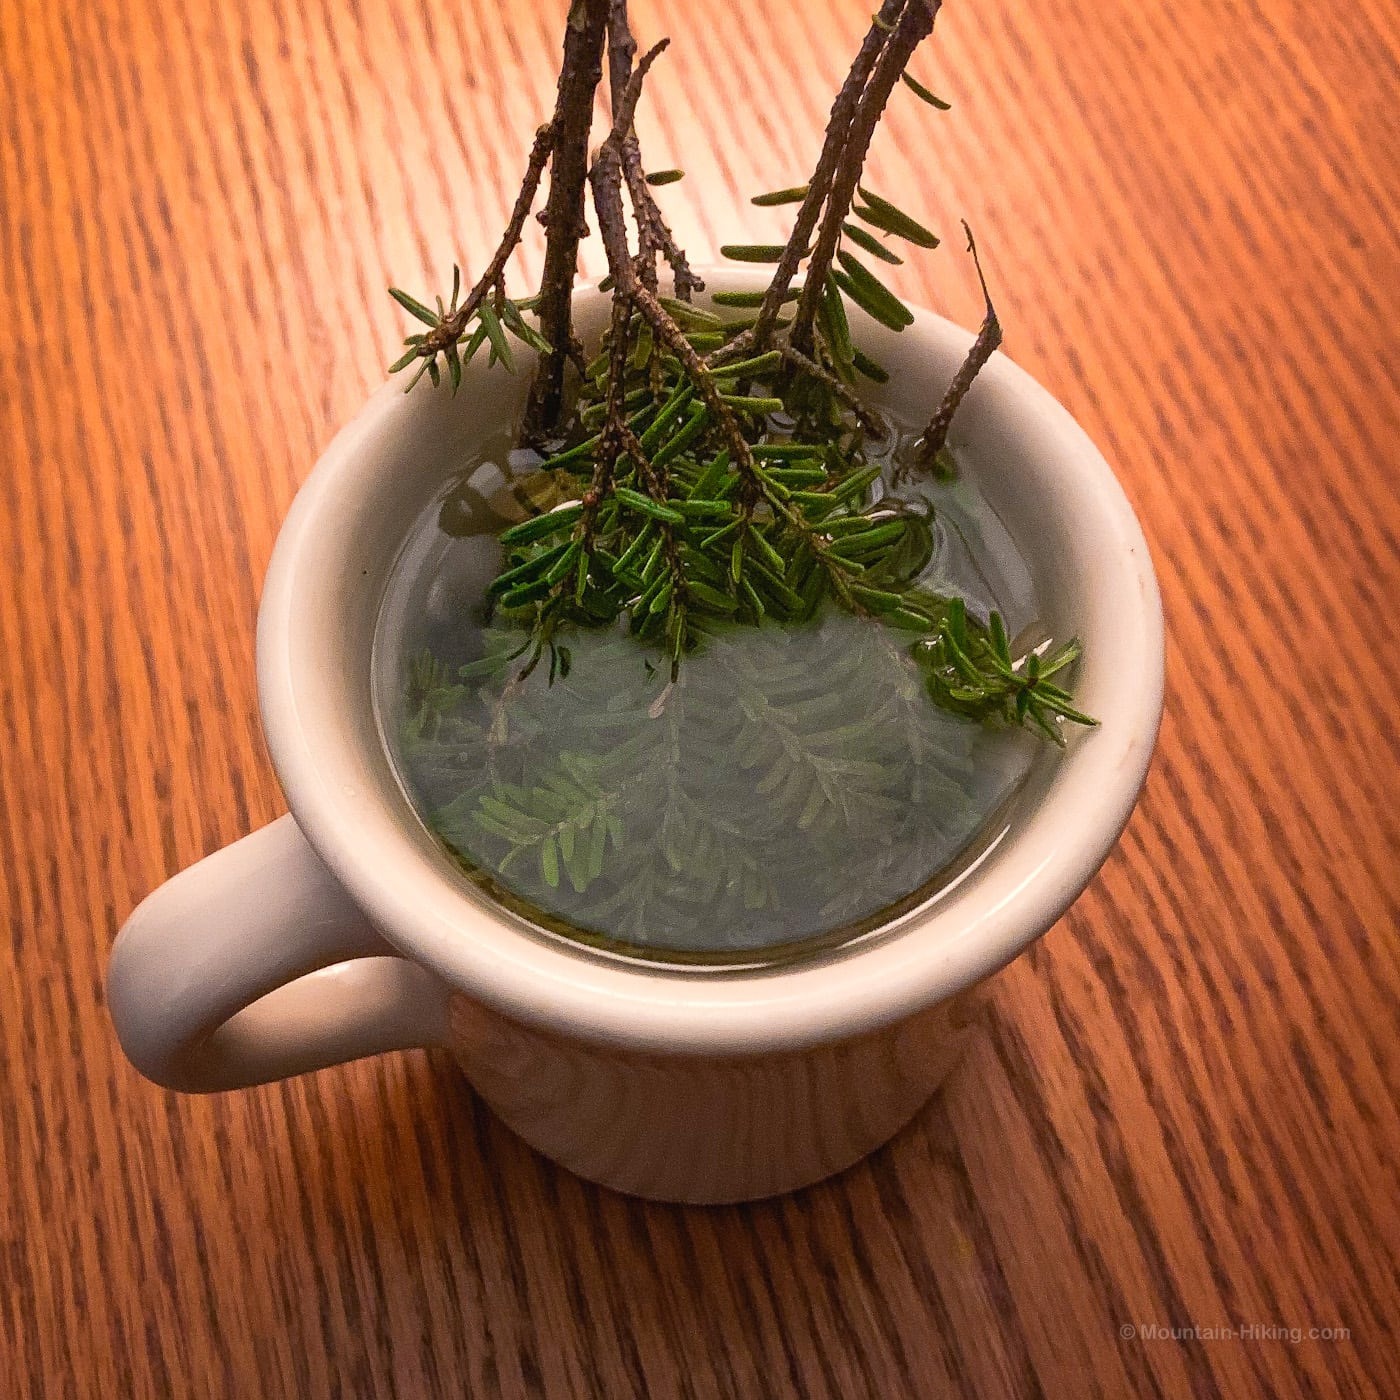 brewing pine needle tea / hemlock twigs in hot water